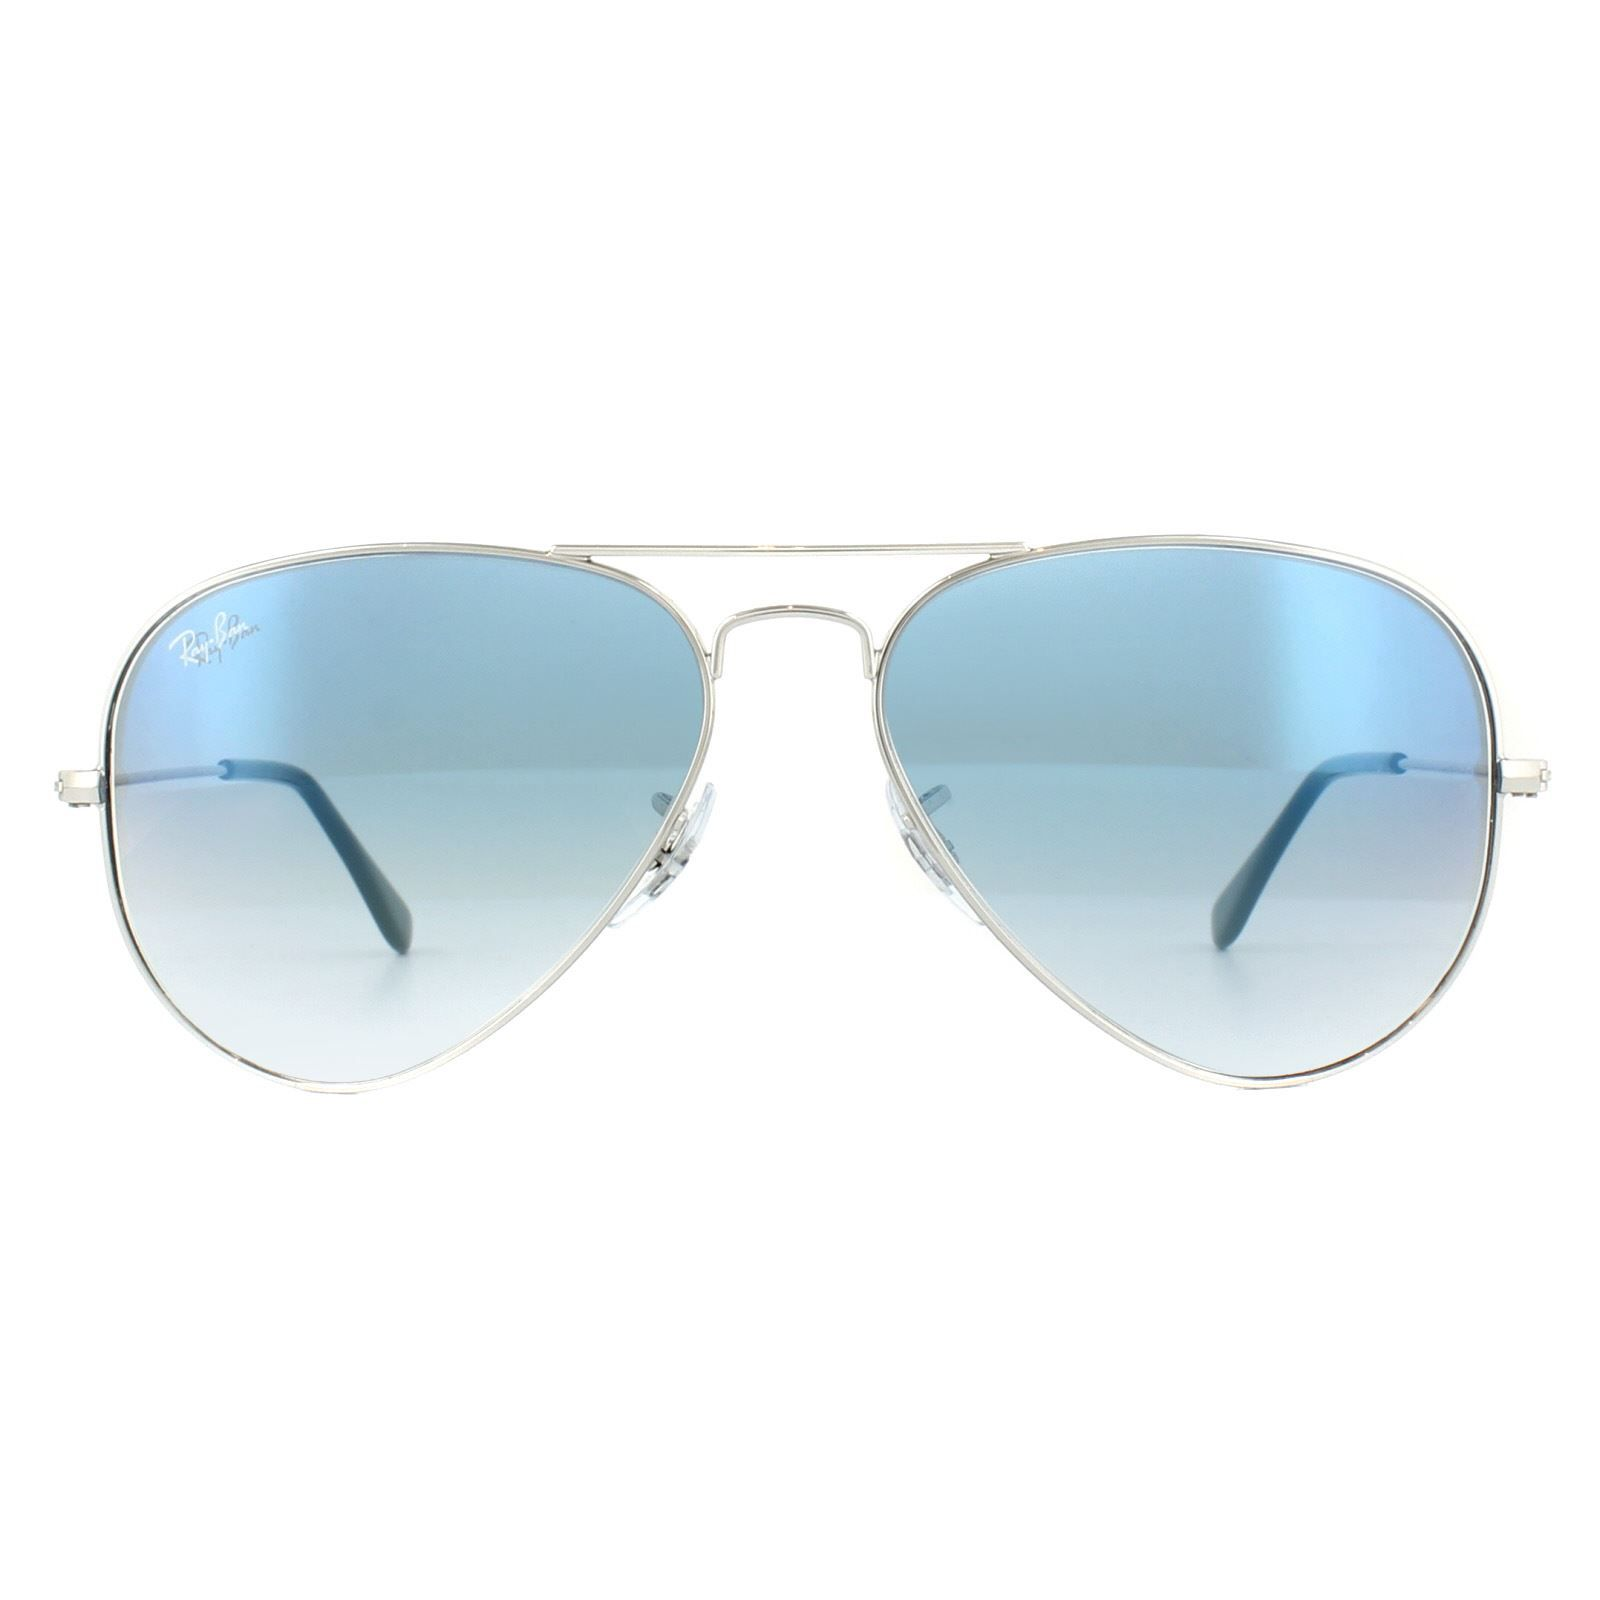 Ray-Ban Sunglasses Aviator 3025 Silver Gradient Light Blue 003/3F 62mm